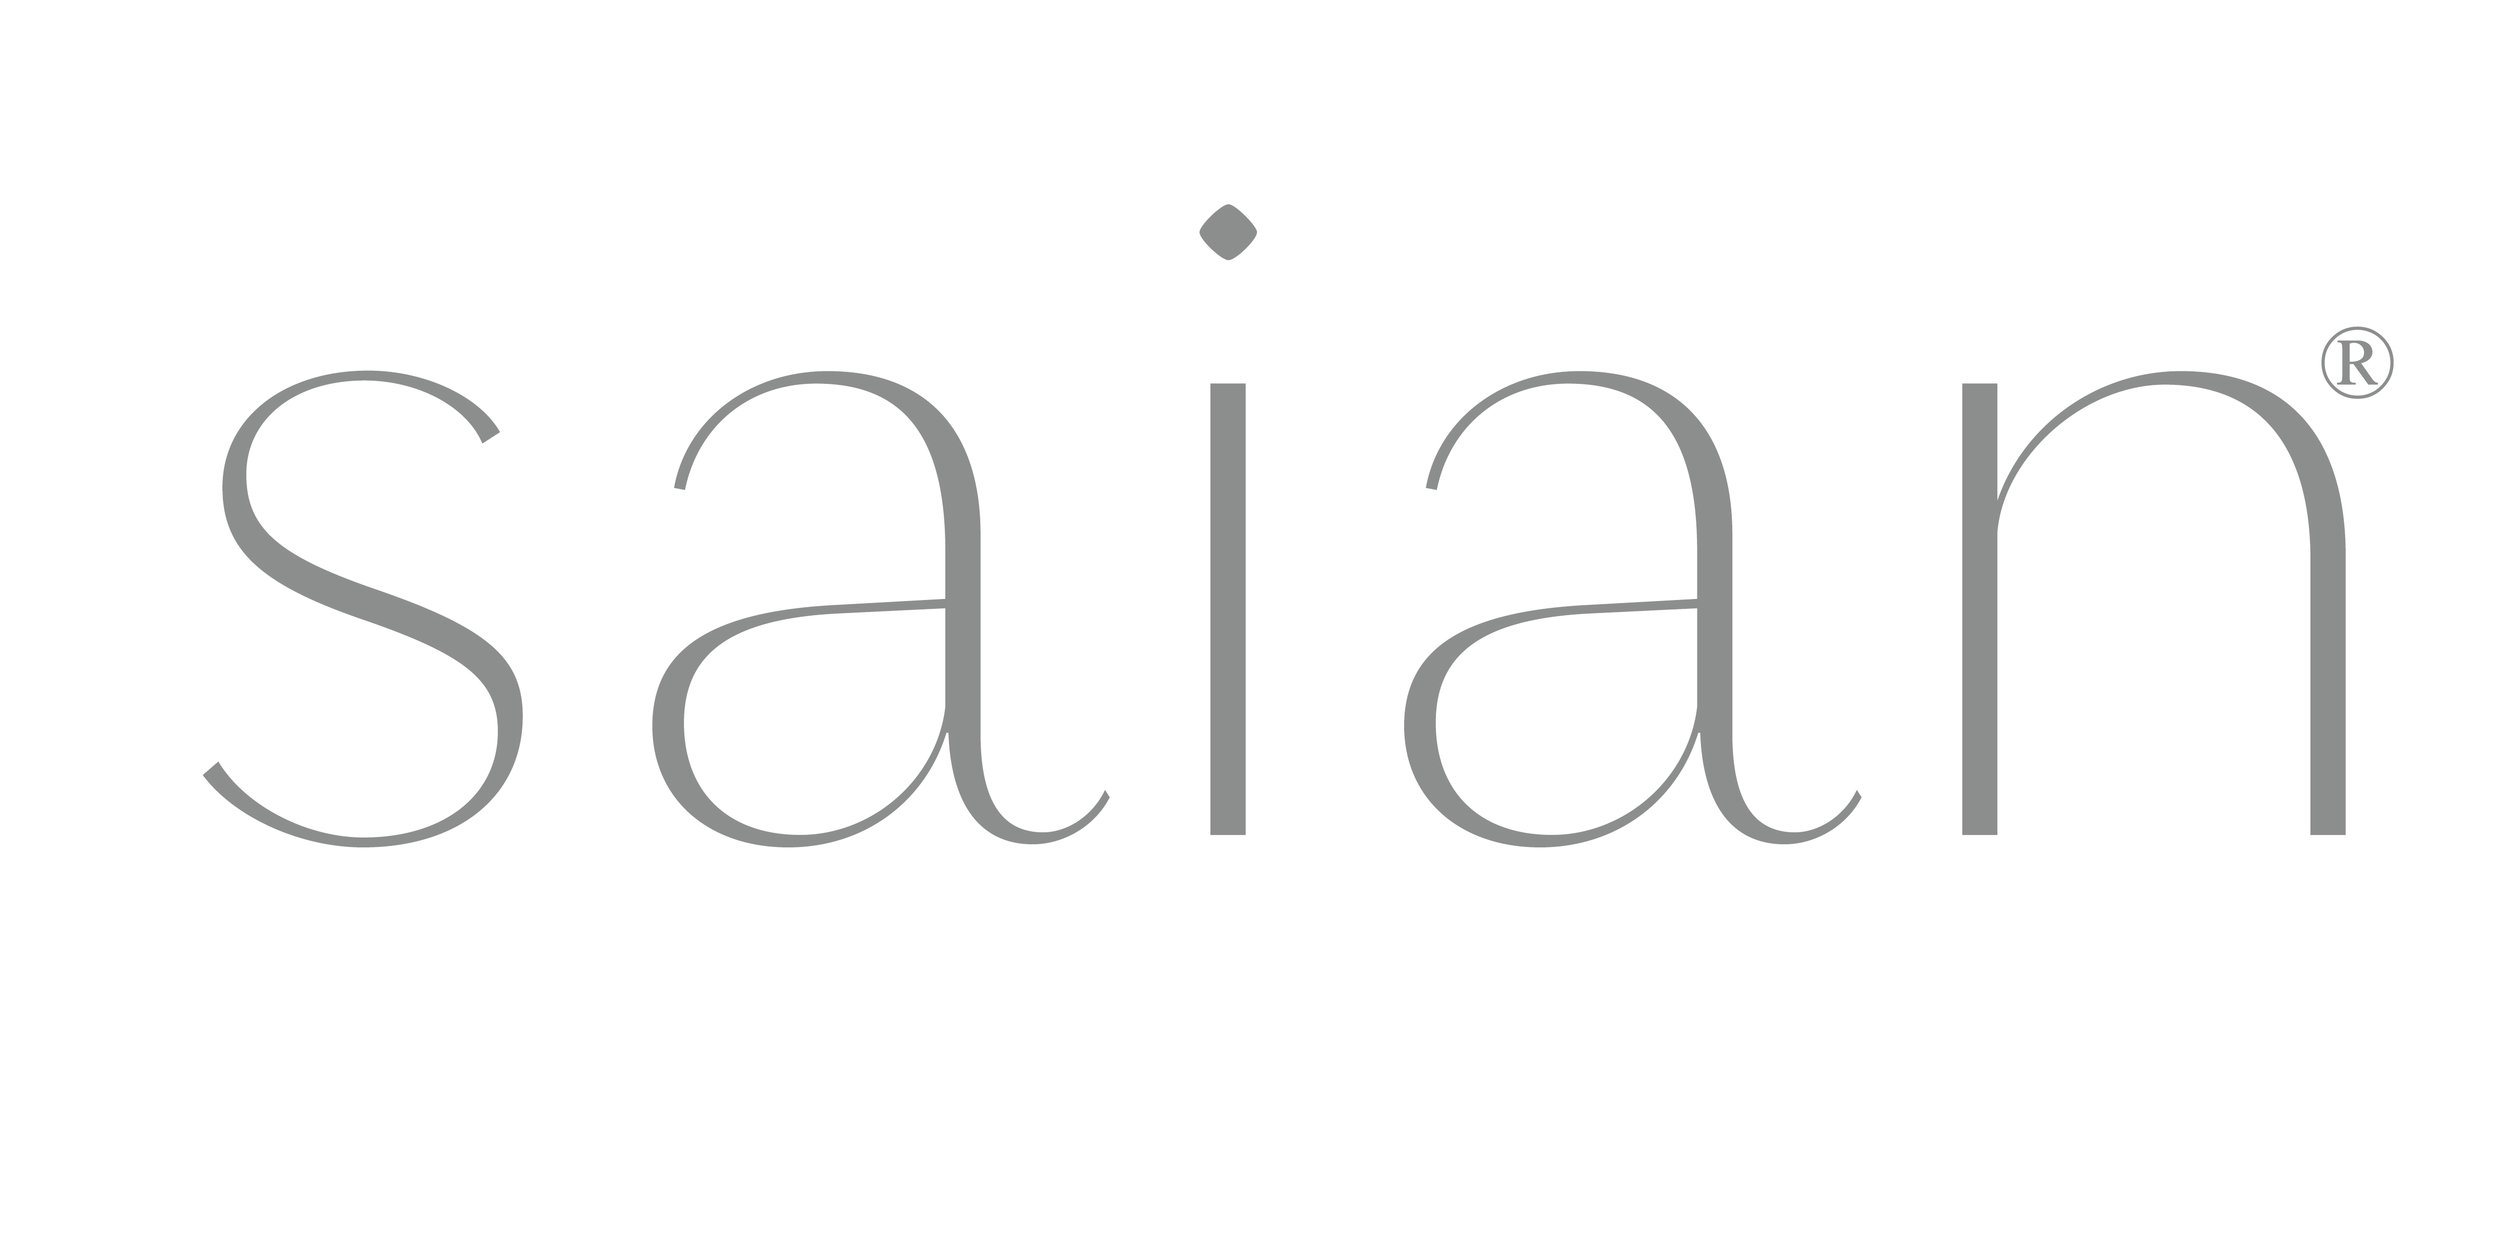 saian new logo 2019.jpg